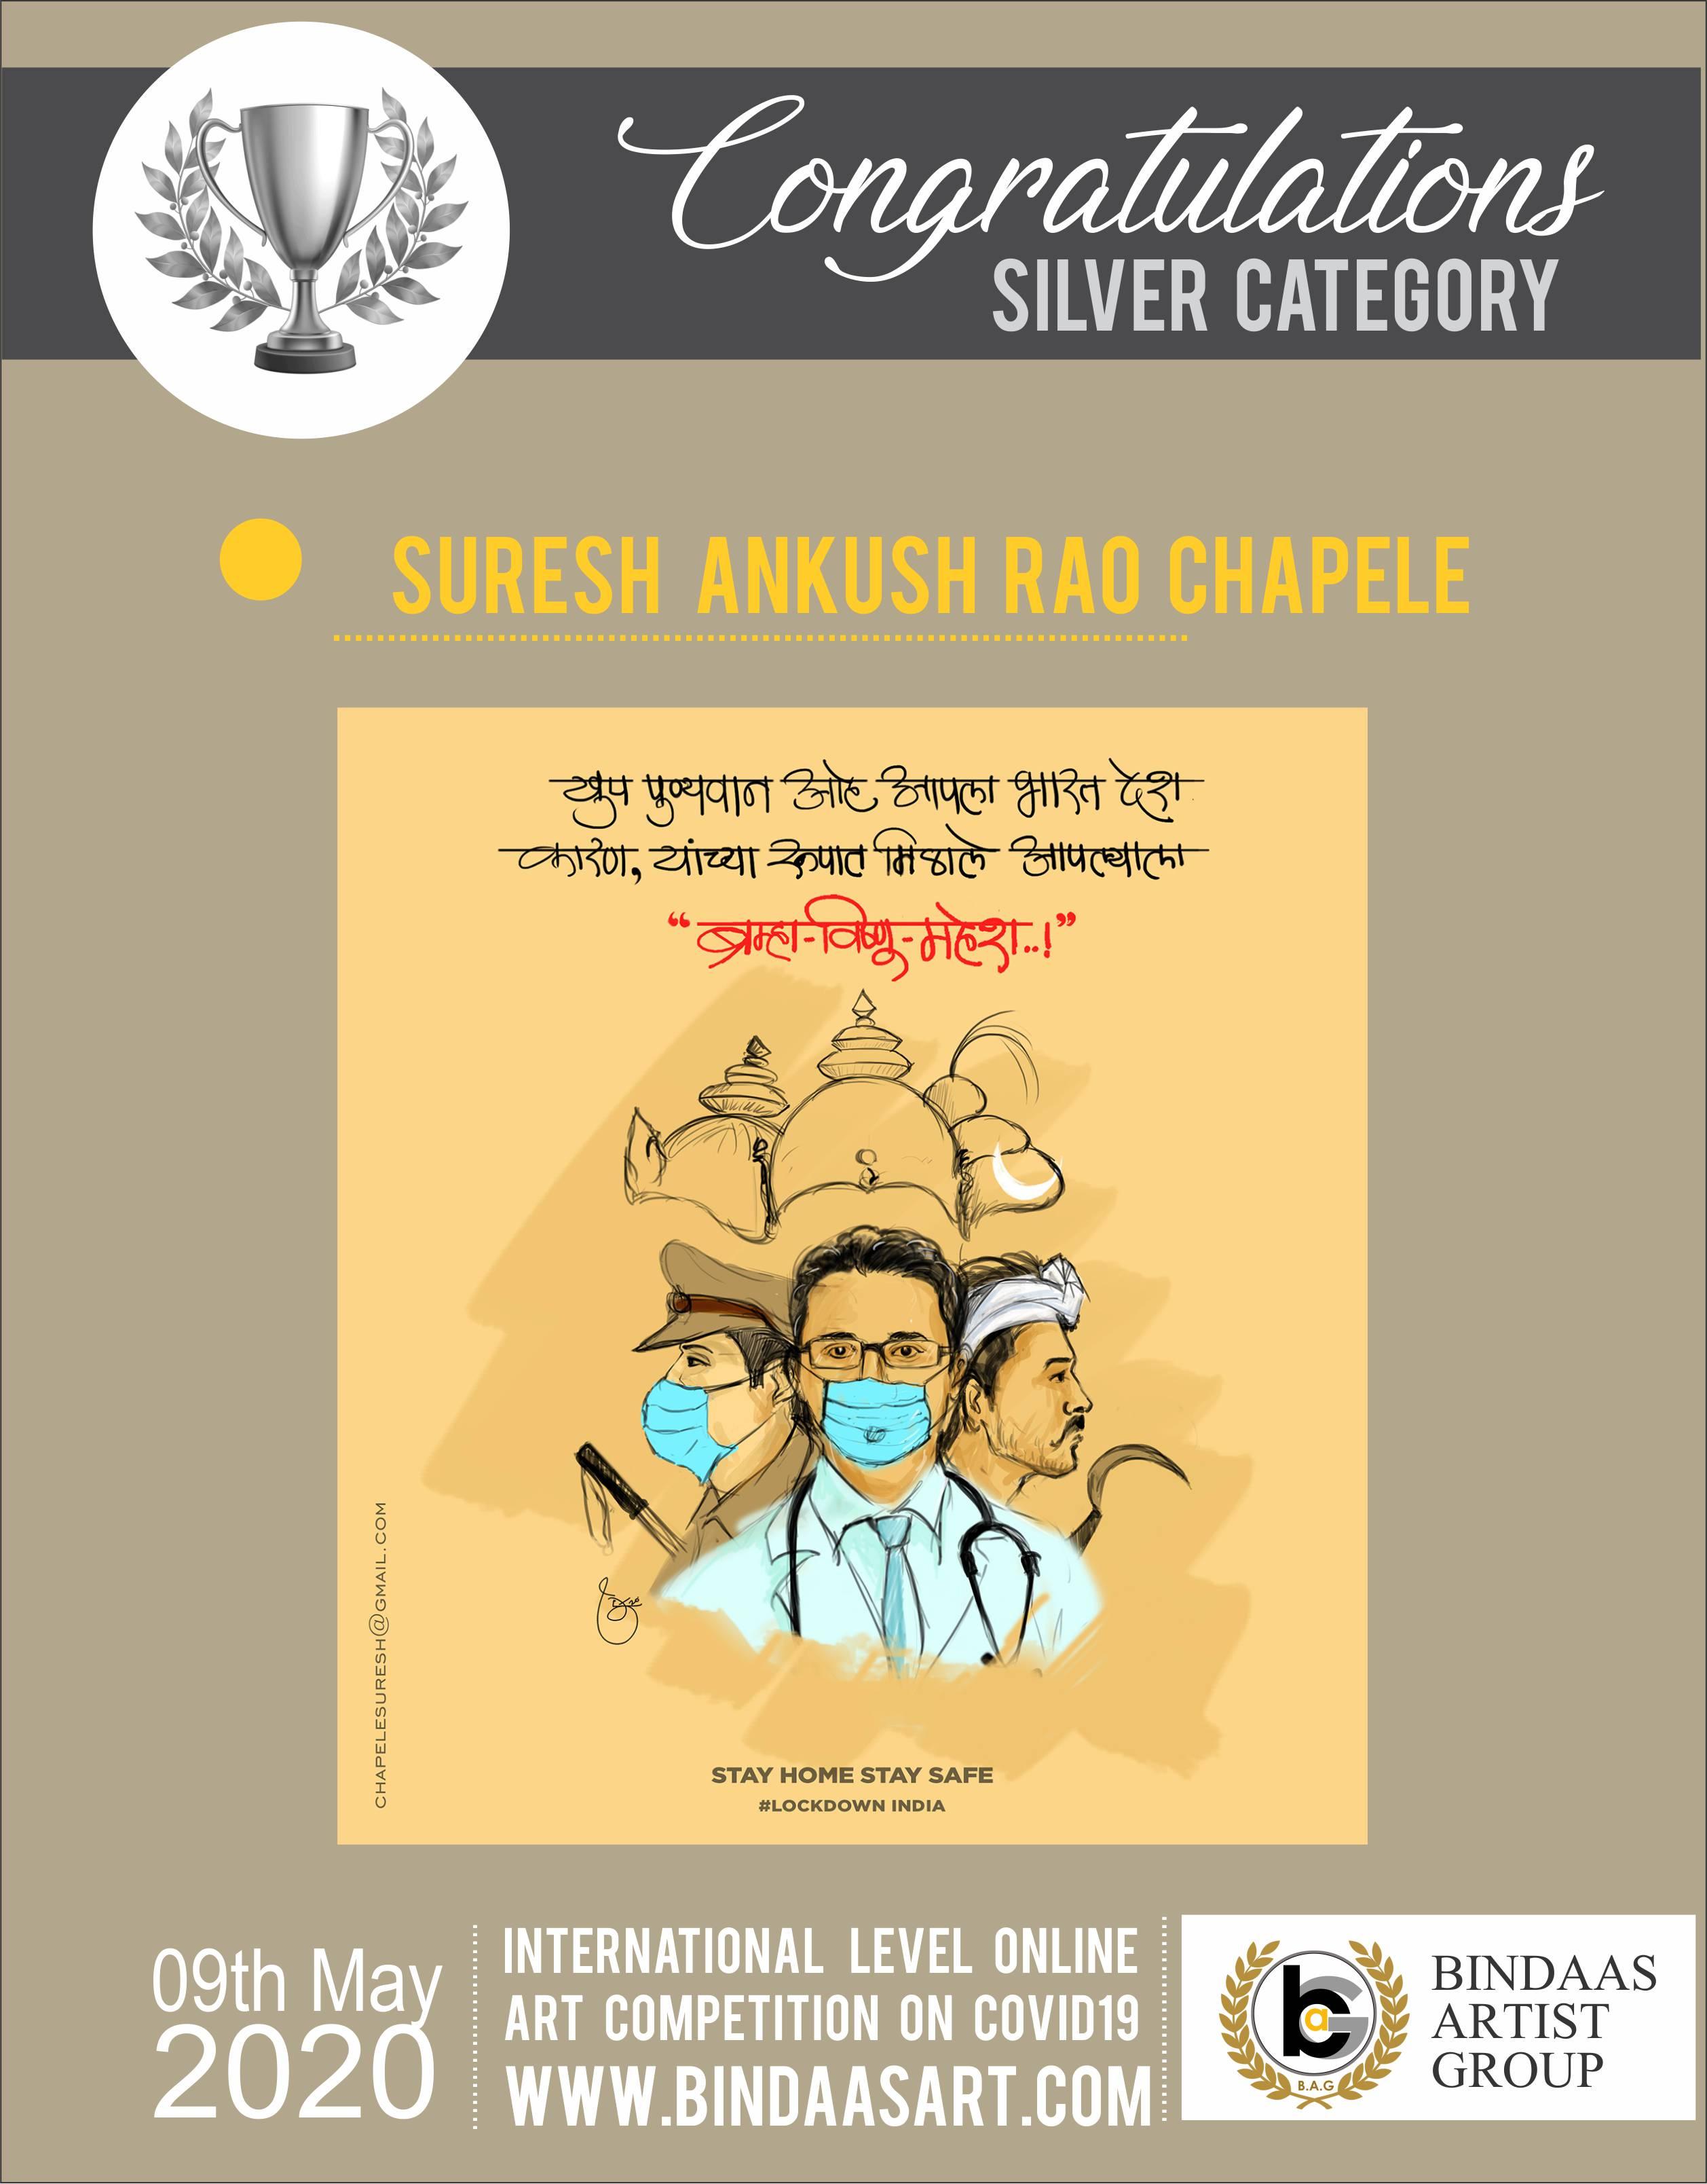 Suresh Ankushrao Chapele